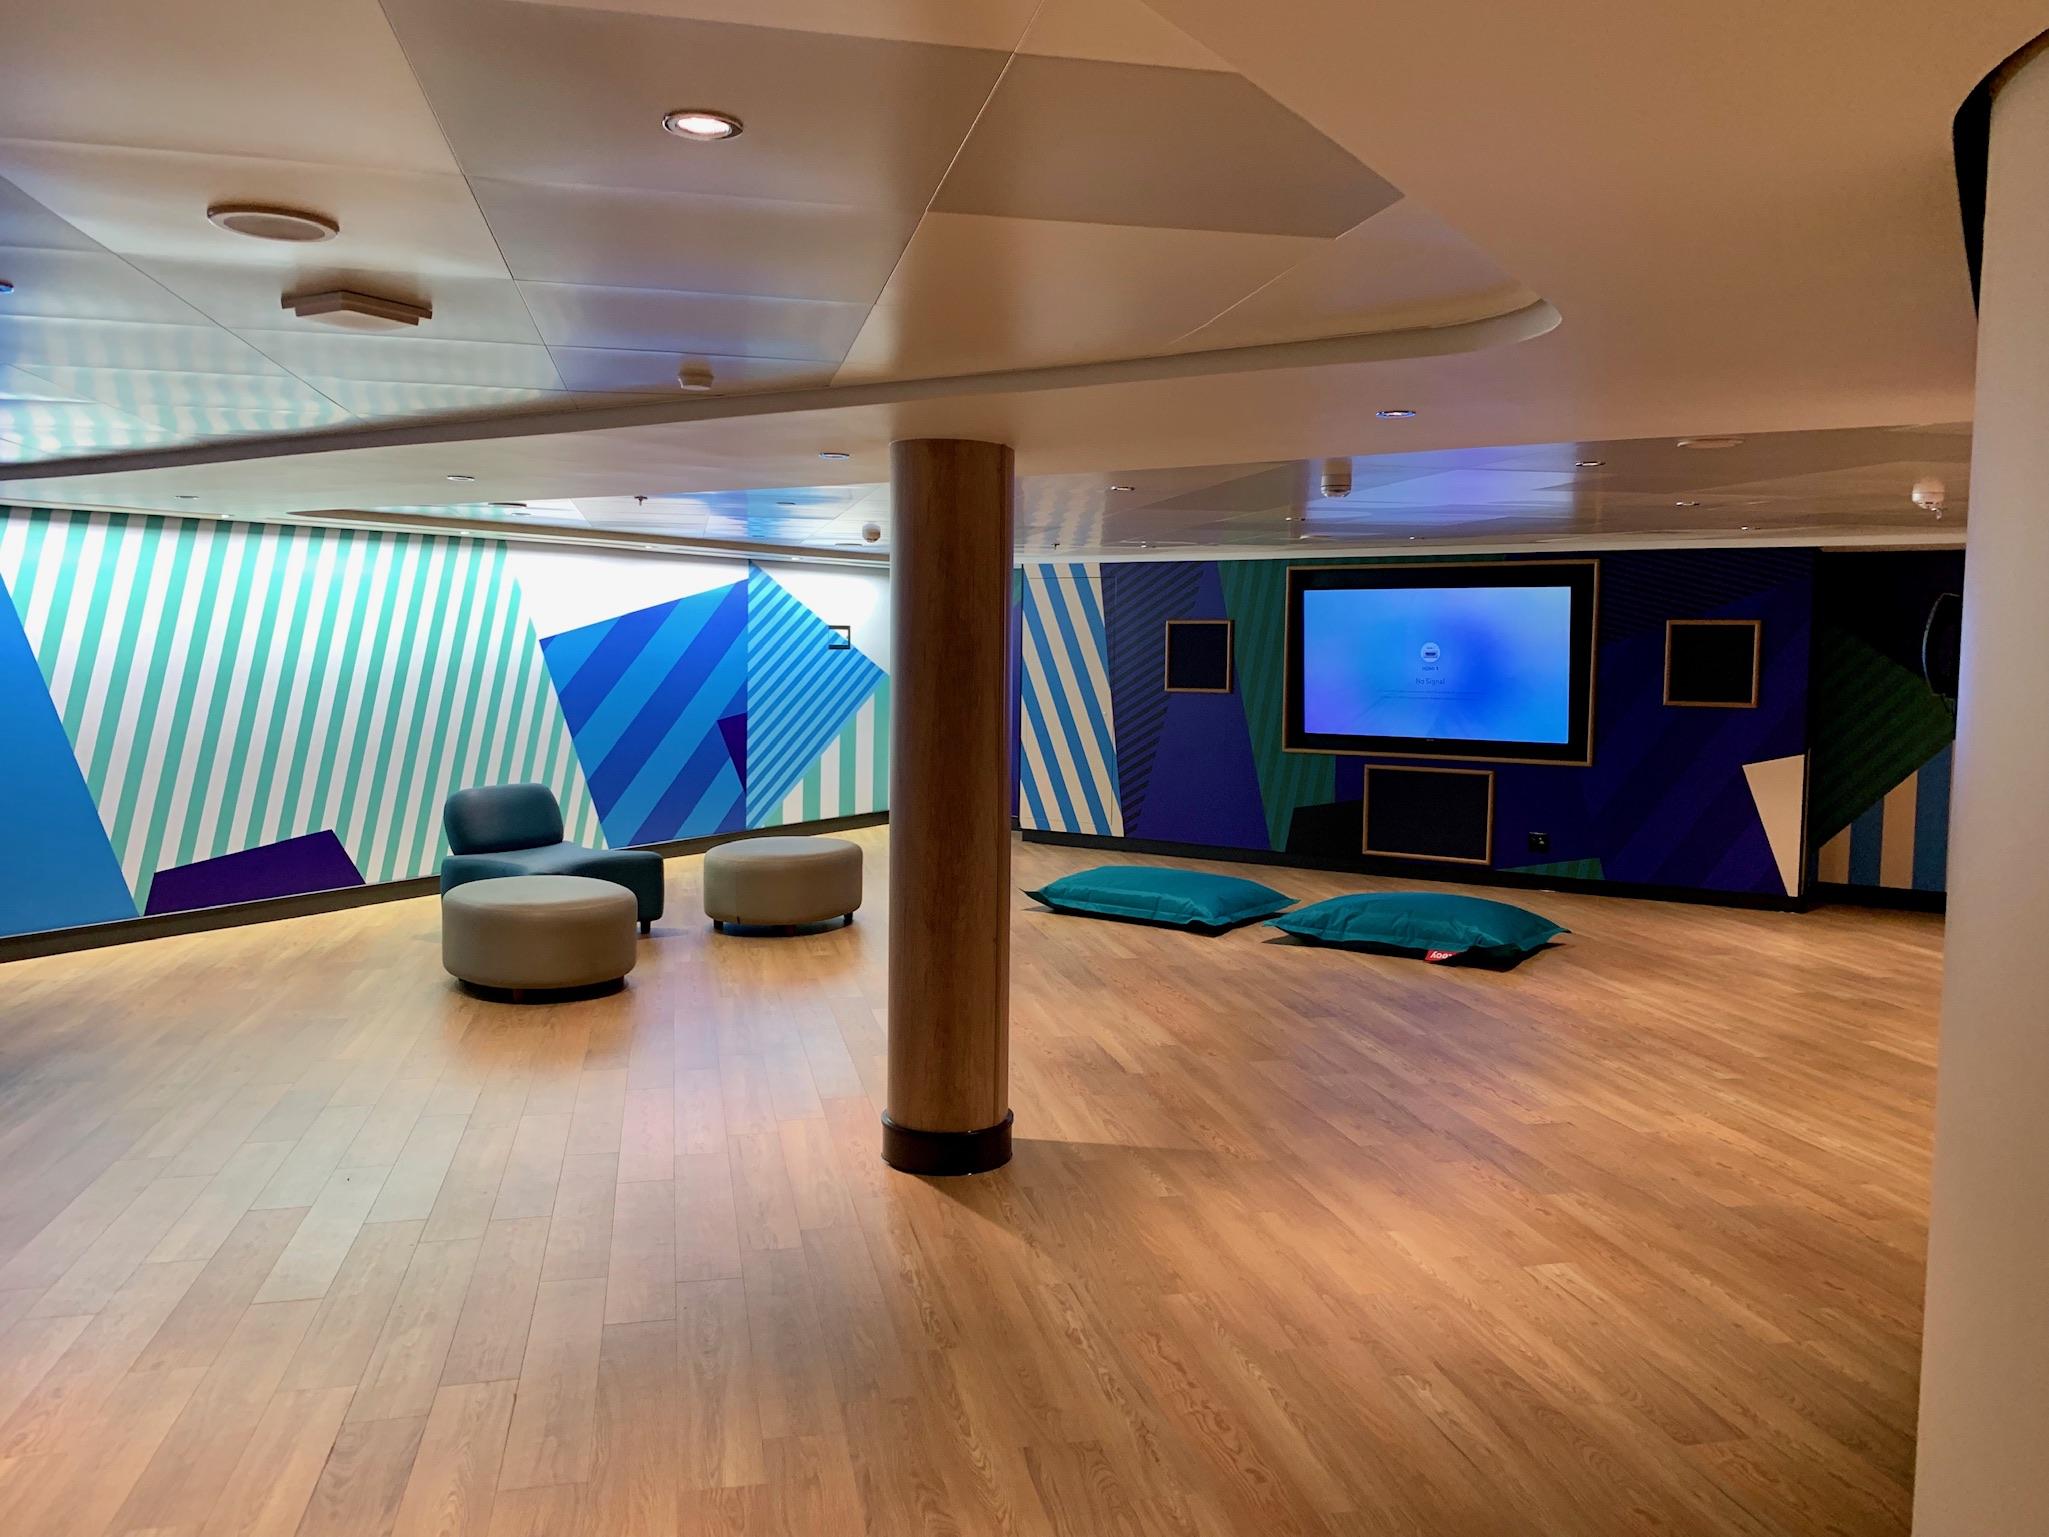 NCL Joy - Amenities - Splash Club large room.jpg